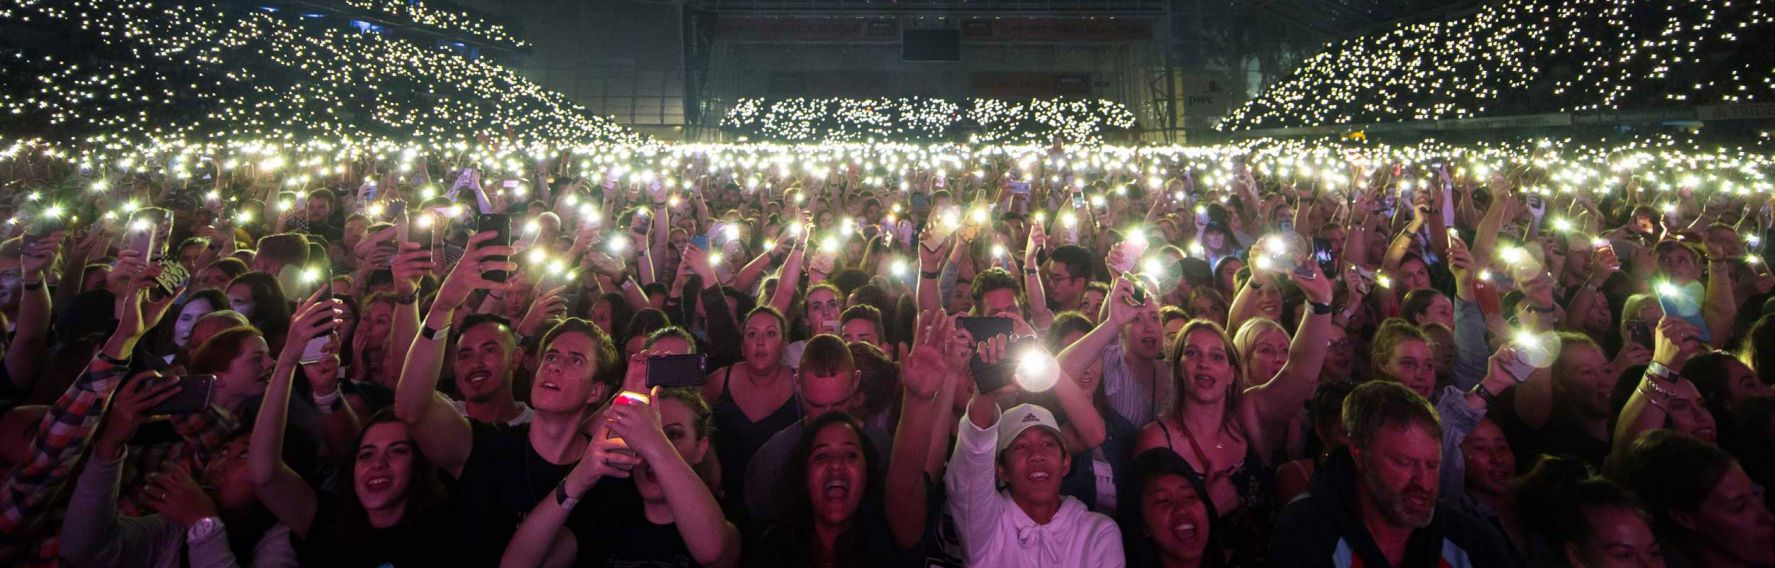 Ed Sheeran crowd